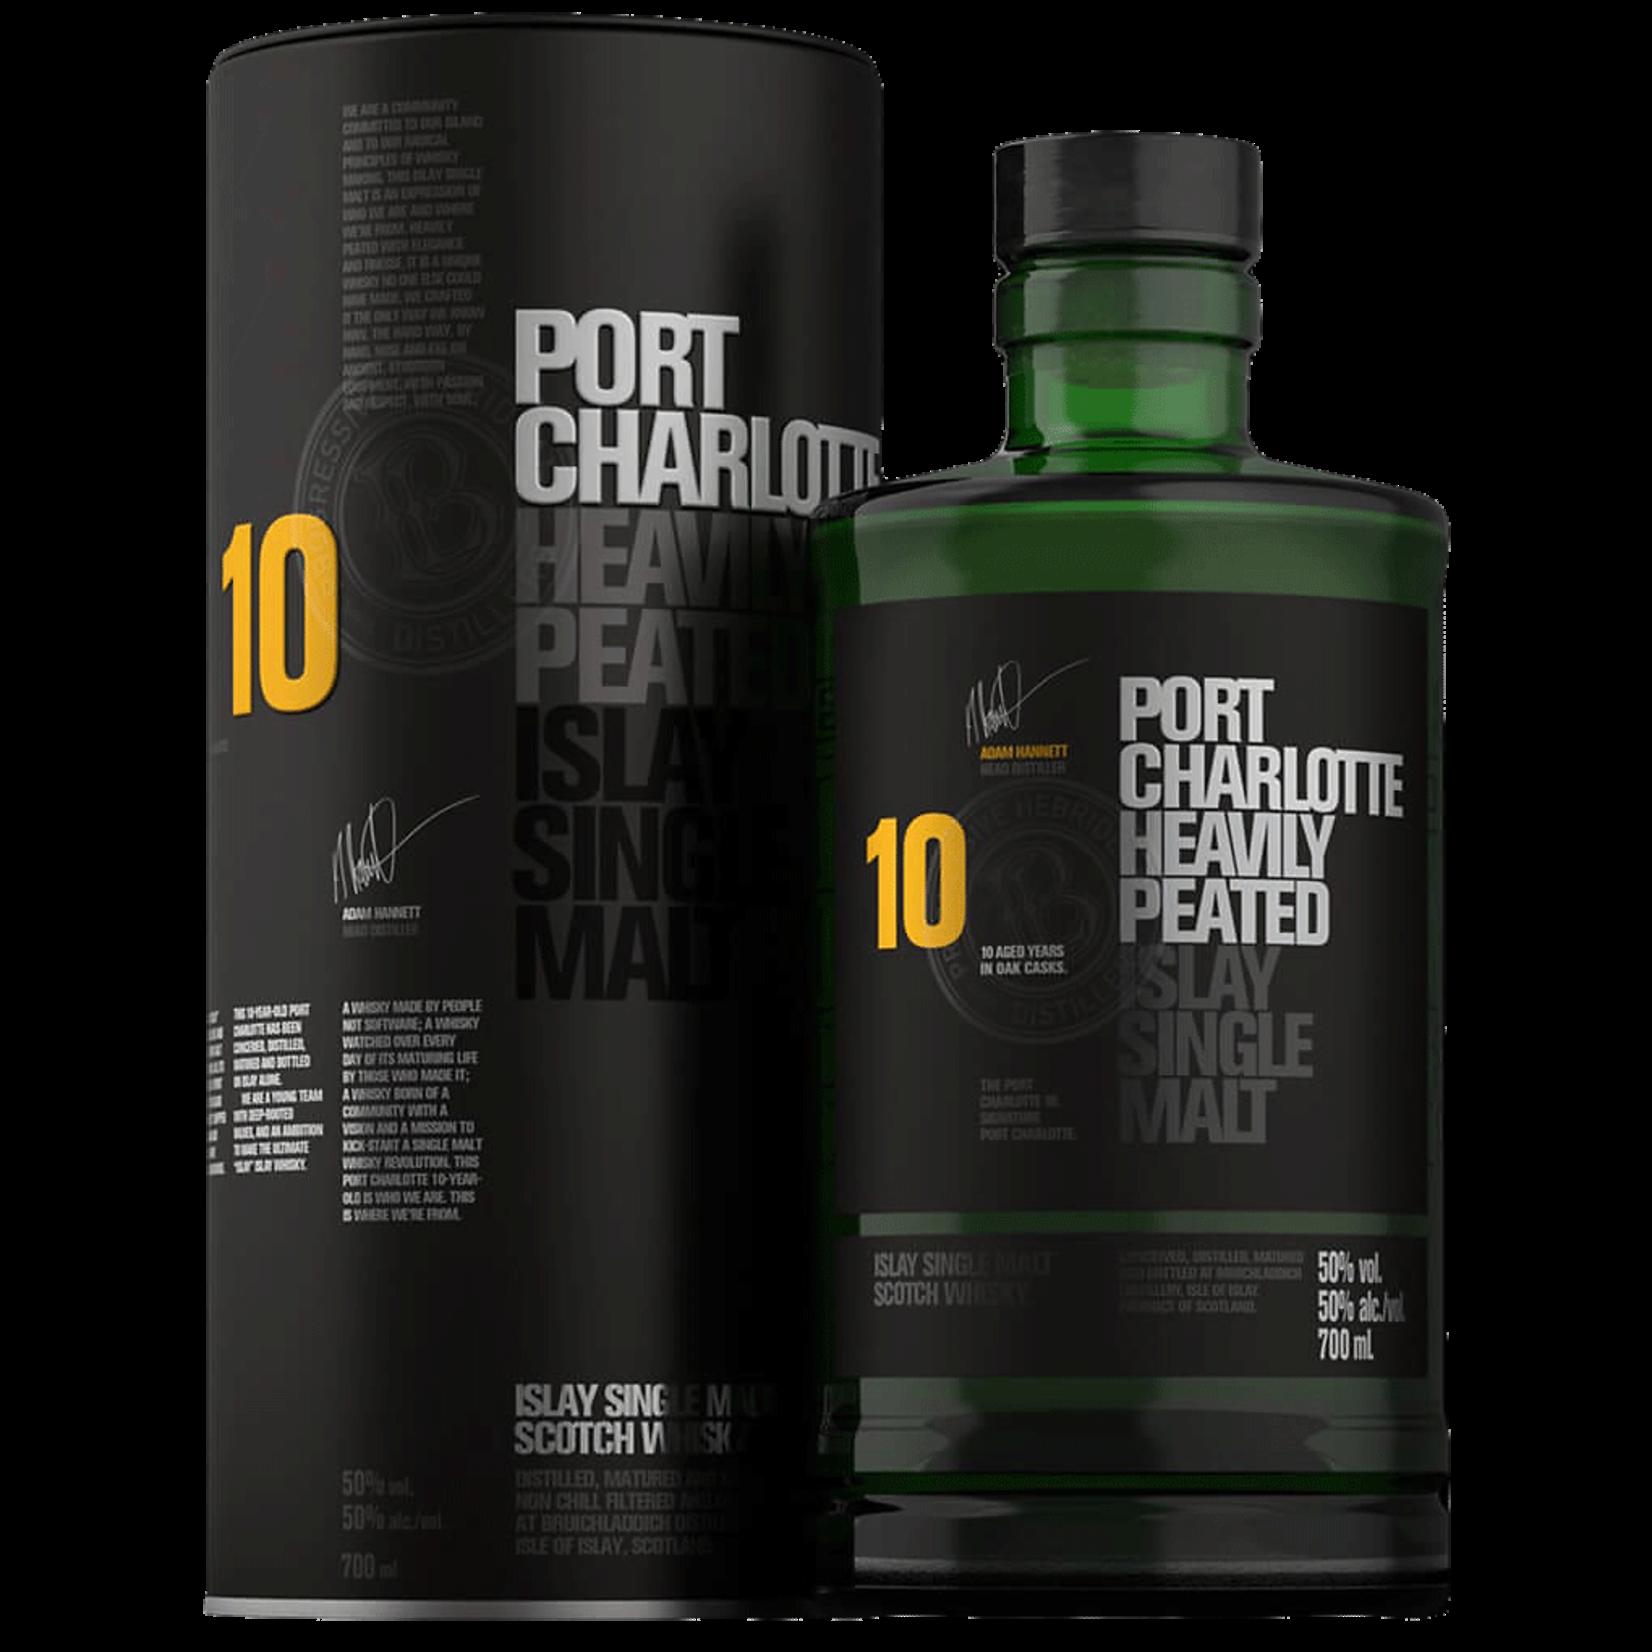 Bruichladdich Single Malt Scotch Port Charlotte 10 Year Heavily Peated